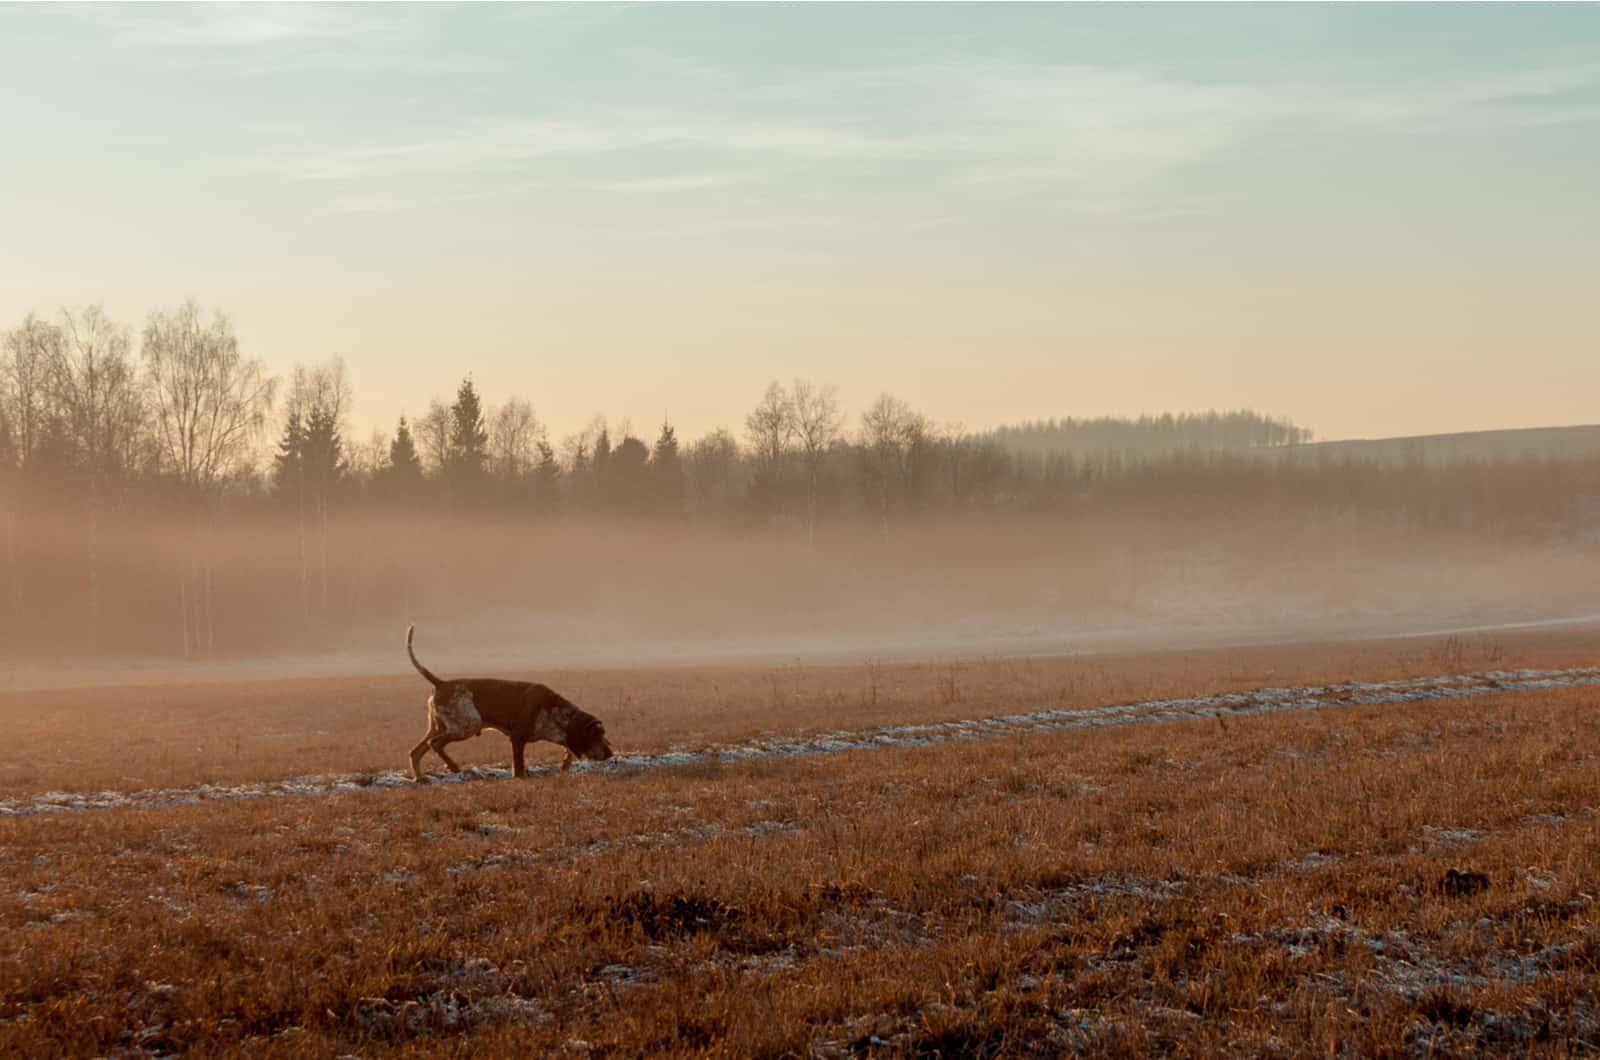 hunting dog photographeed on a foggy morning